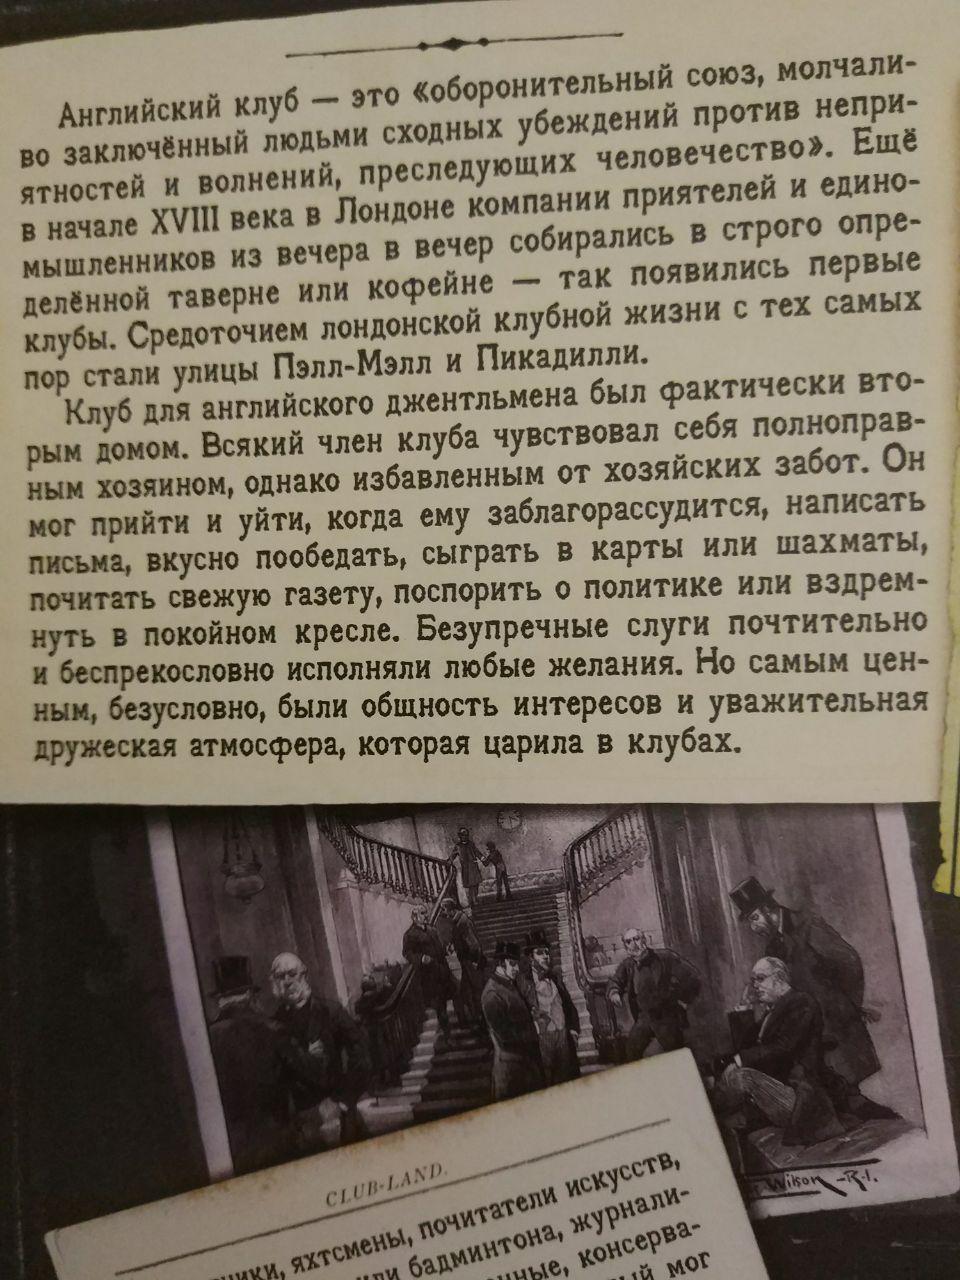 http://s4.uploads.ru/5n8c2.jpg